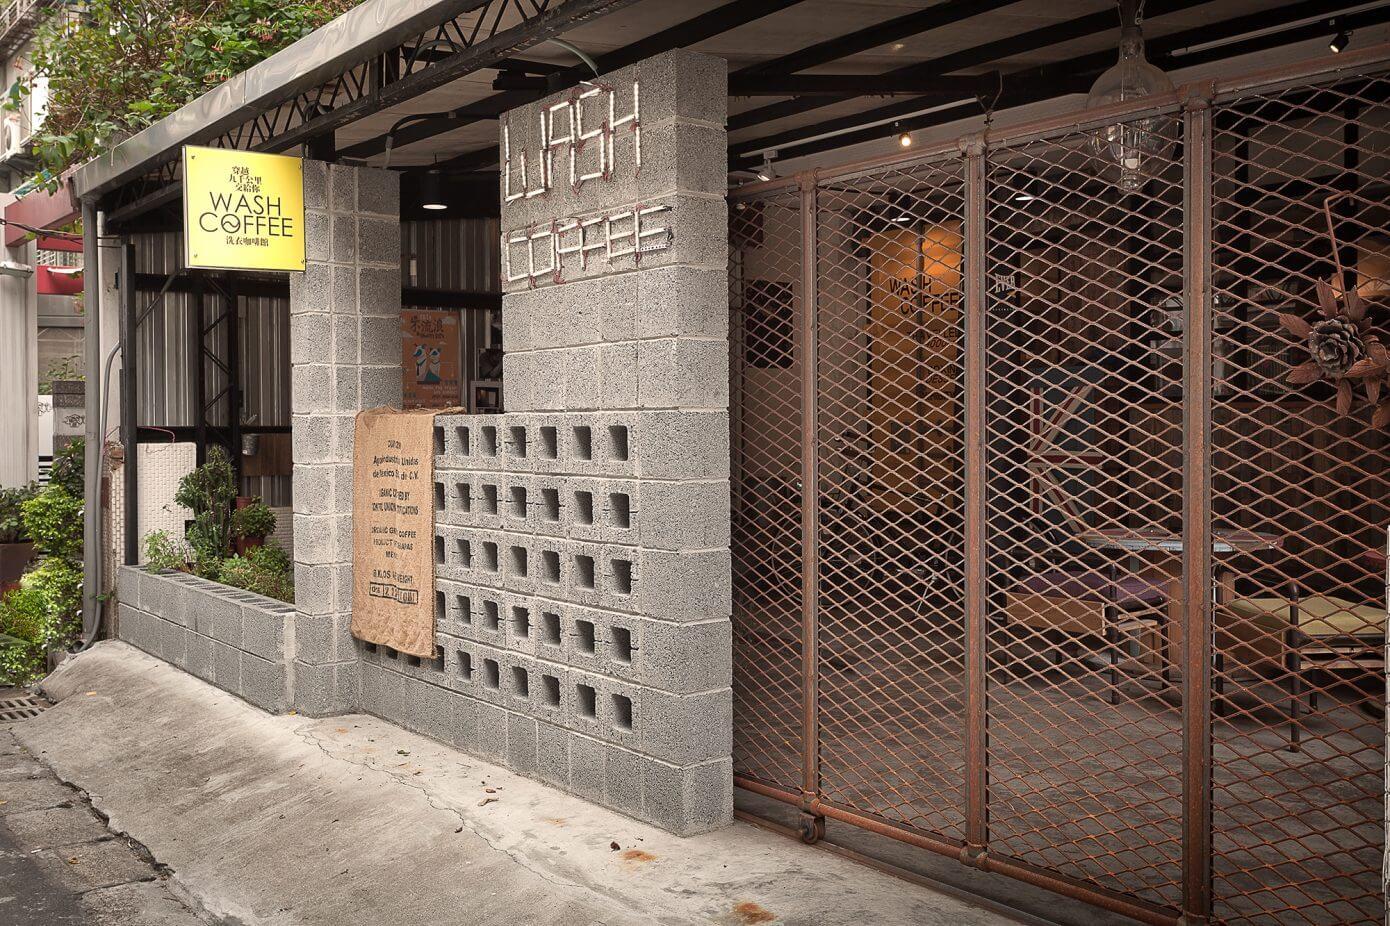 014-laundry-coffee-shop-formo-design-studio-1390x926